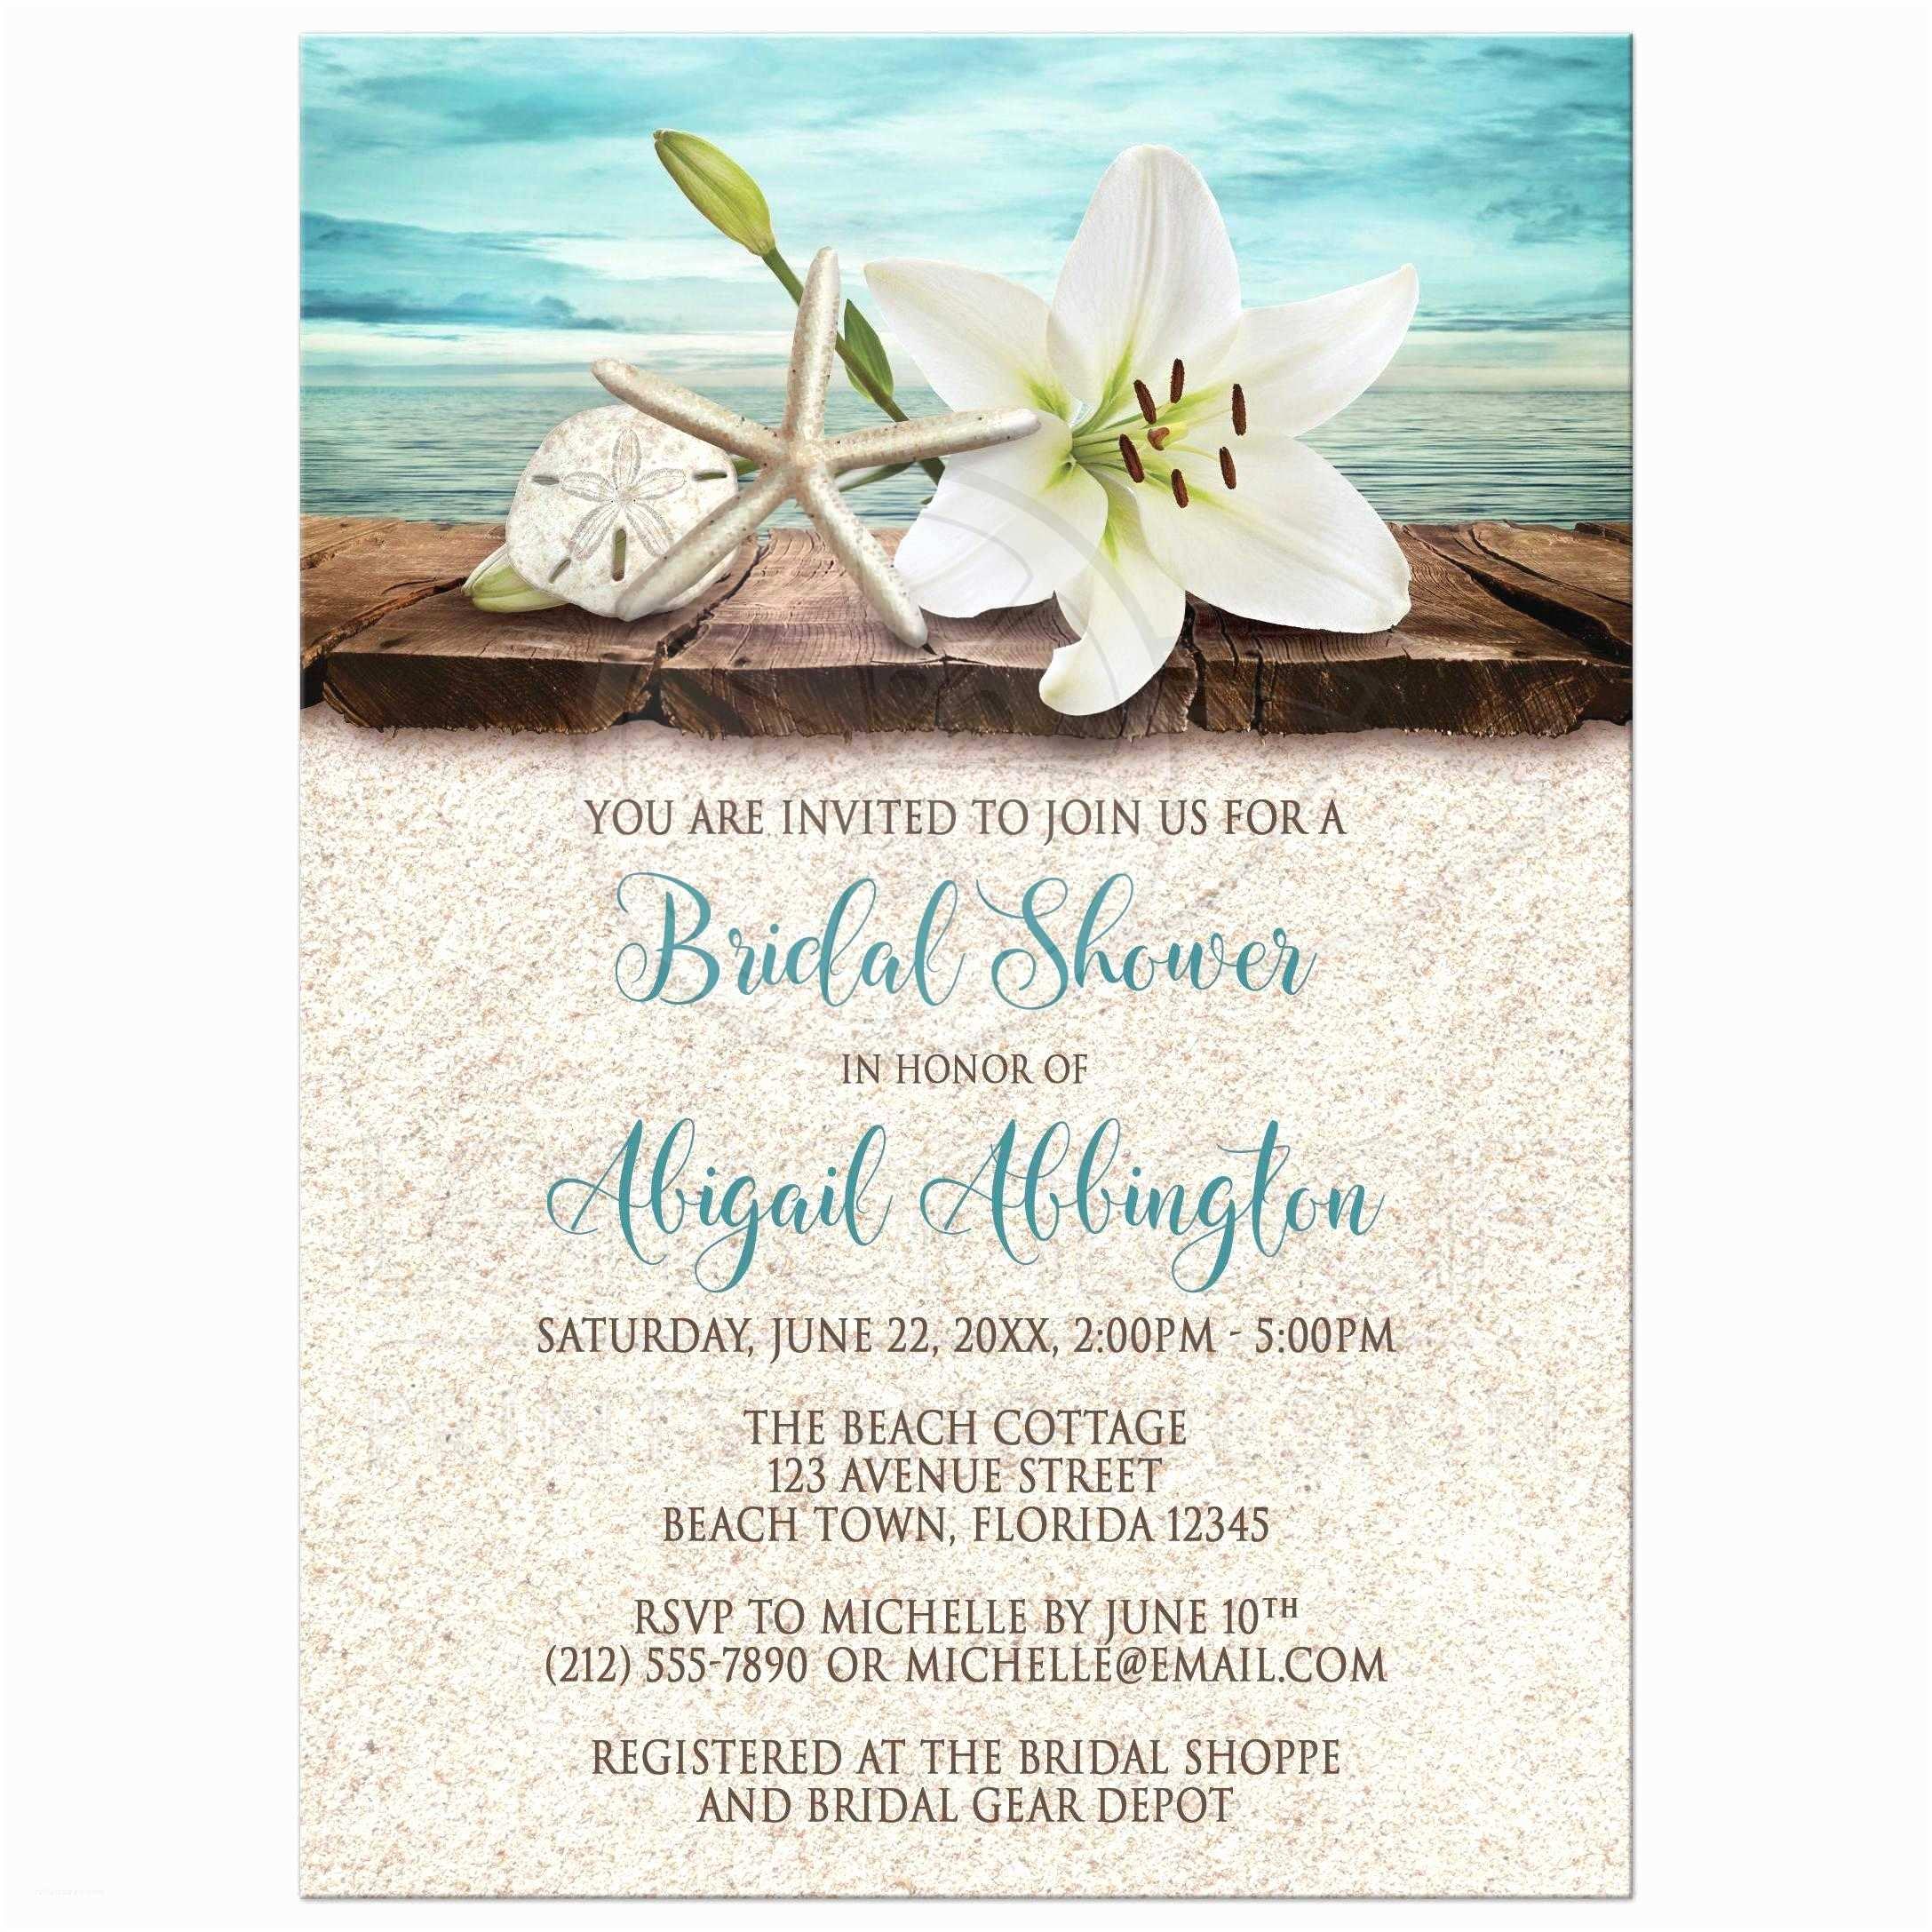 Beach themed Bridal Shower Invitations Bridal Shower Invitations Beach Lily Seashells and Sand